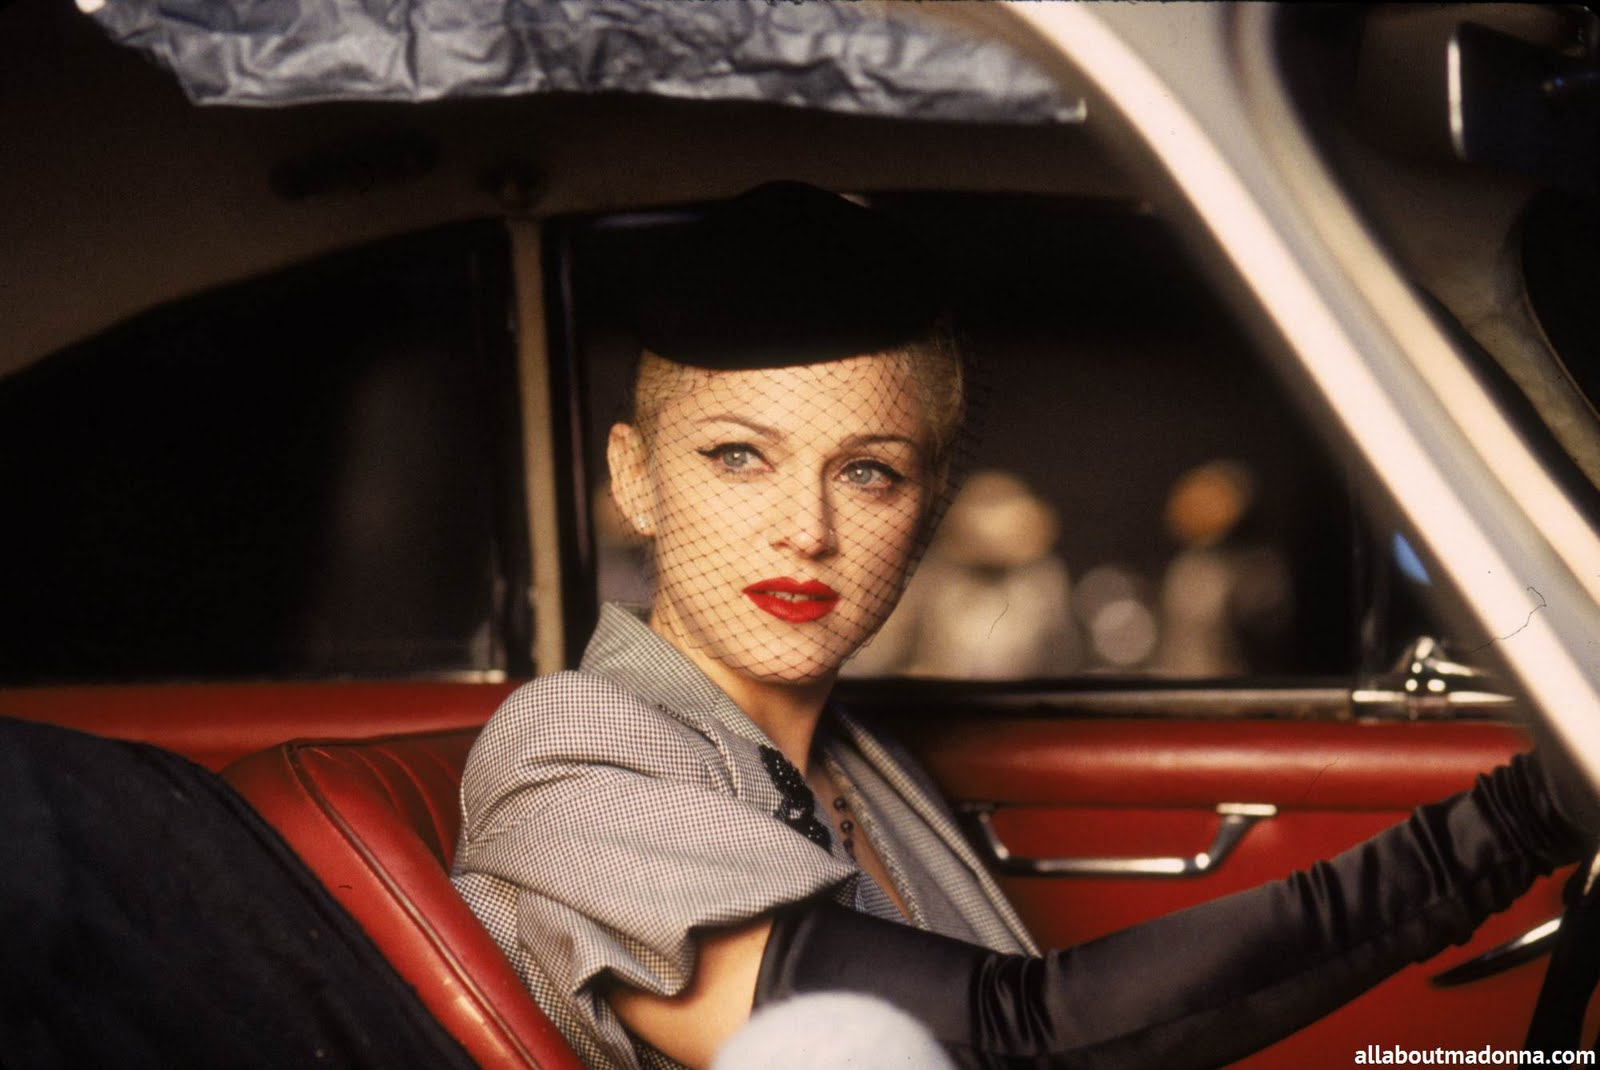 http://1.bp.blogspot.com/--ZV25rTnxRY/TimbgWgsSCI/AAAAAAAAAMw/cHTeHilQf-8/s1600/Madonna+in+Take+A+Bow%252C+1994.jpg